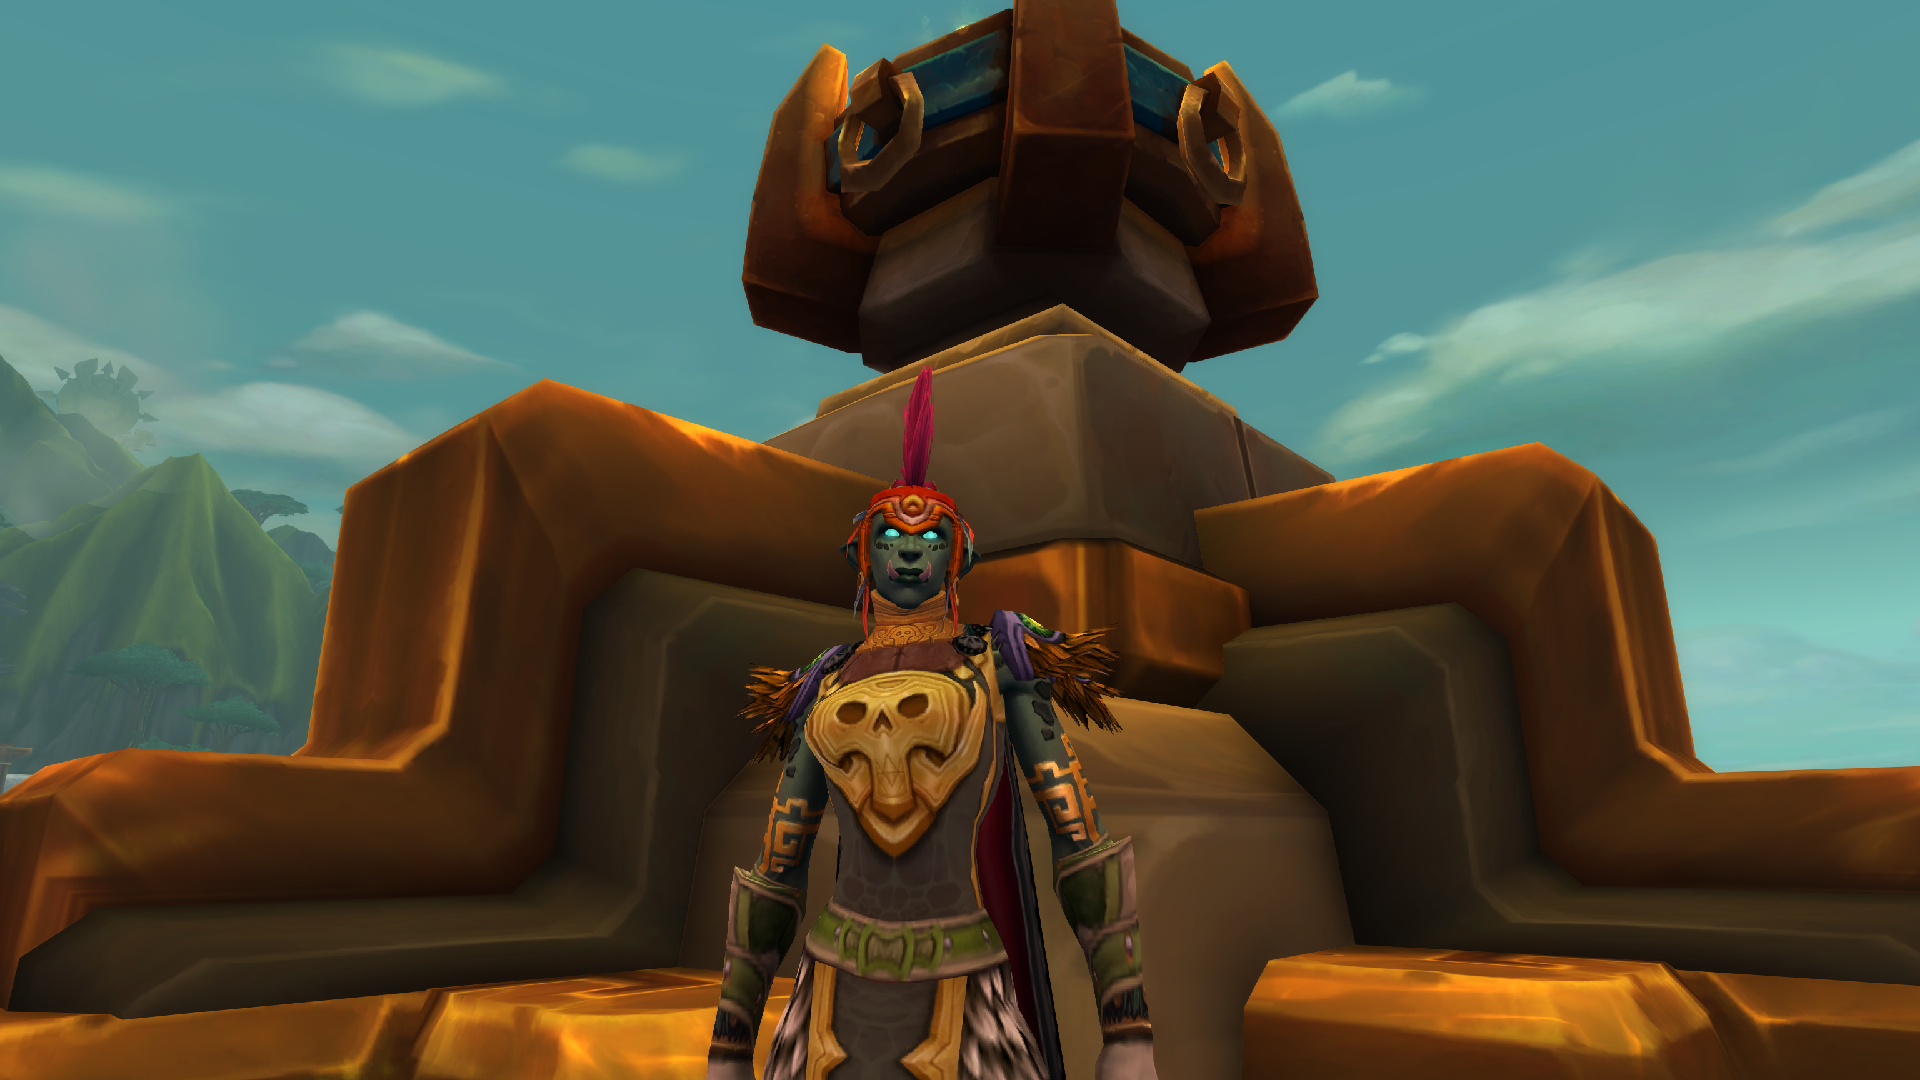 World Of Warcraft Screenshot 2019.05.27 - 12.25.41.01.png